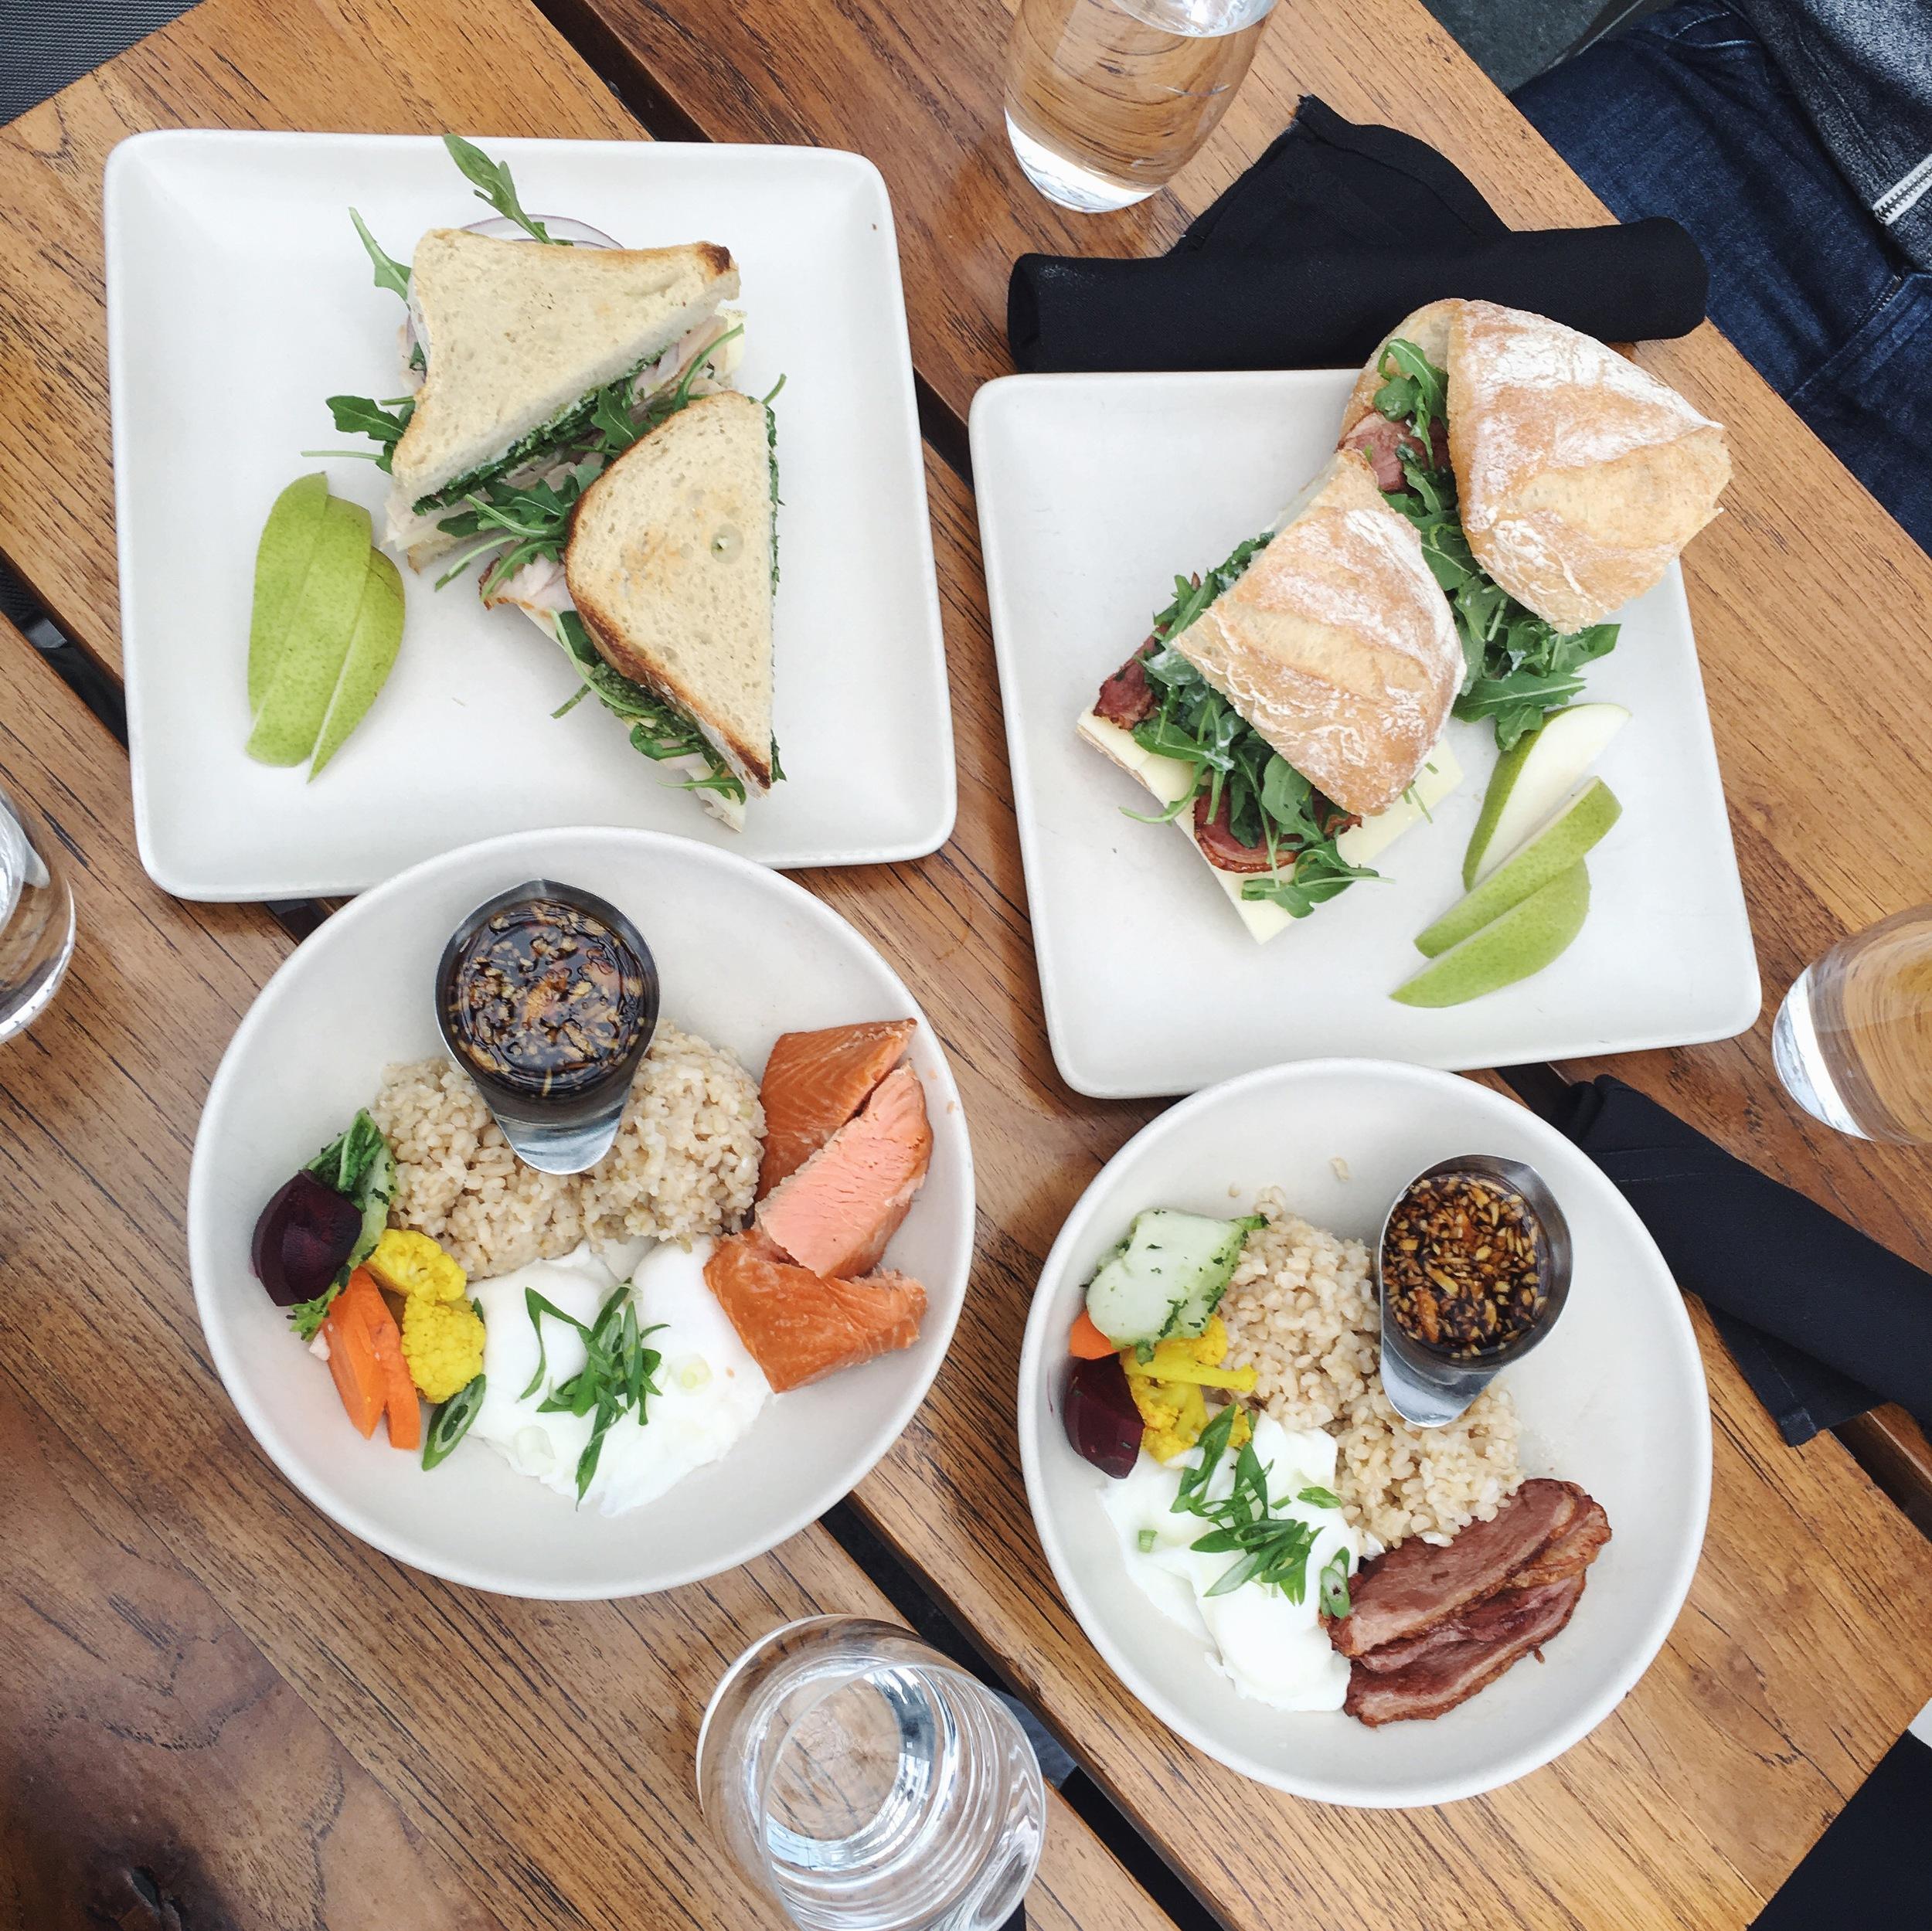 Lunch at Samovar Tea Lounge in San Francisco